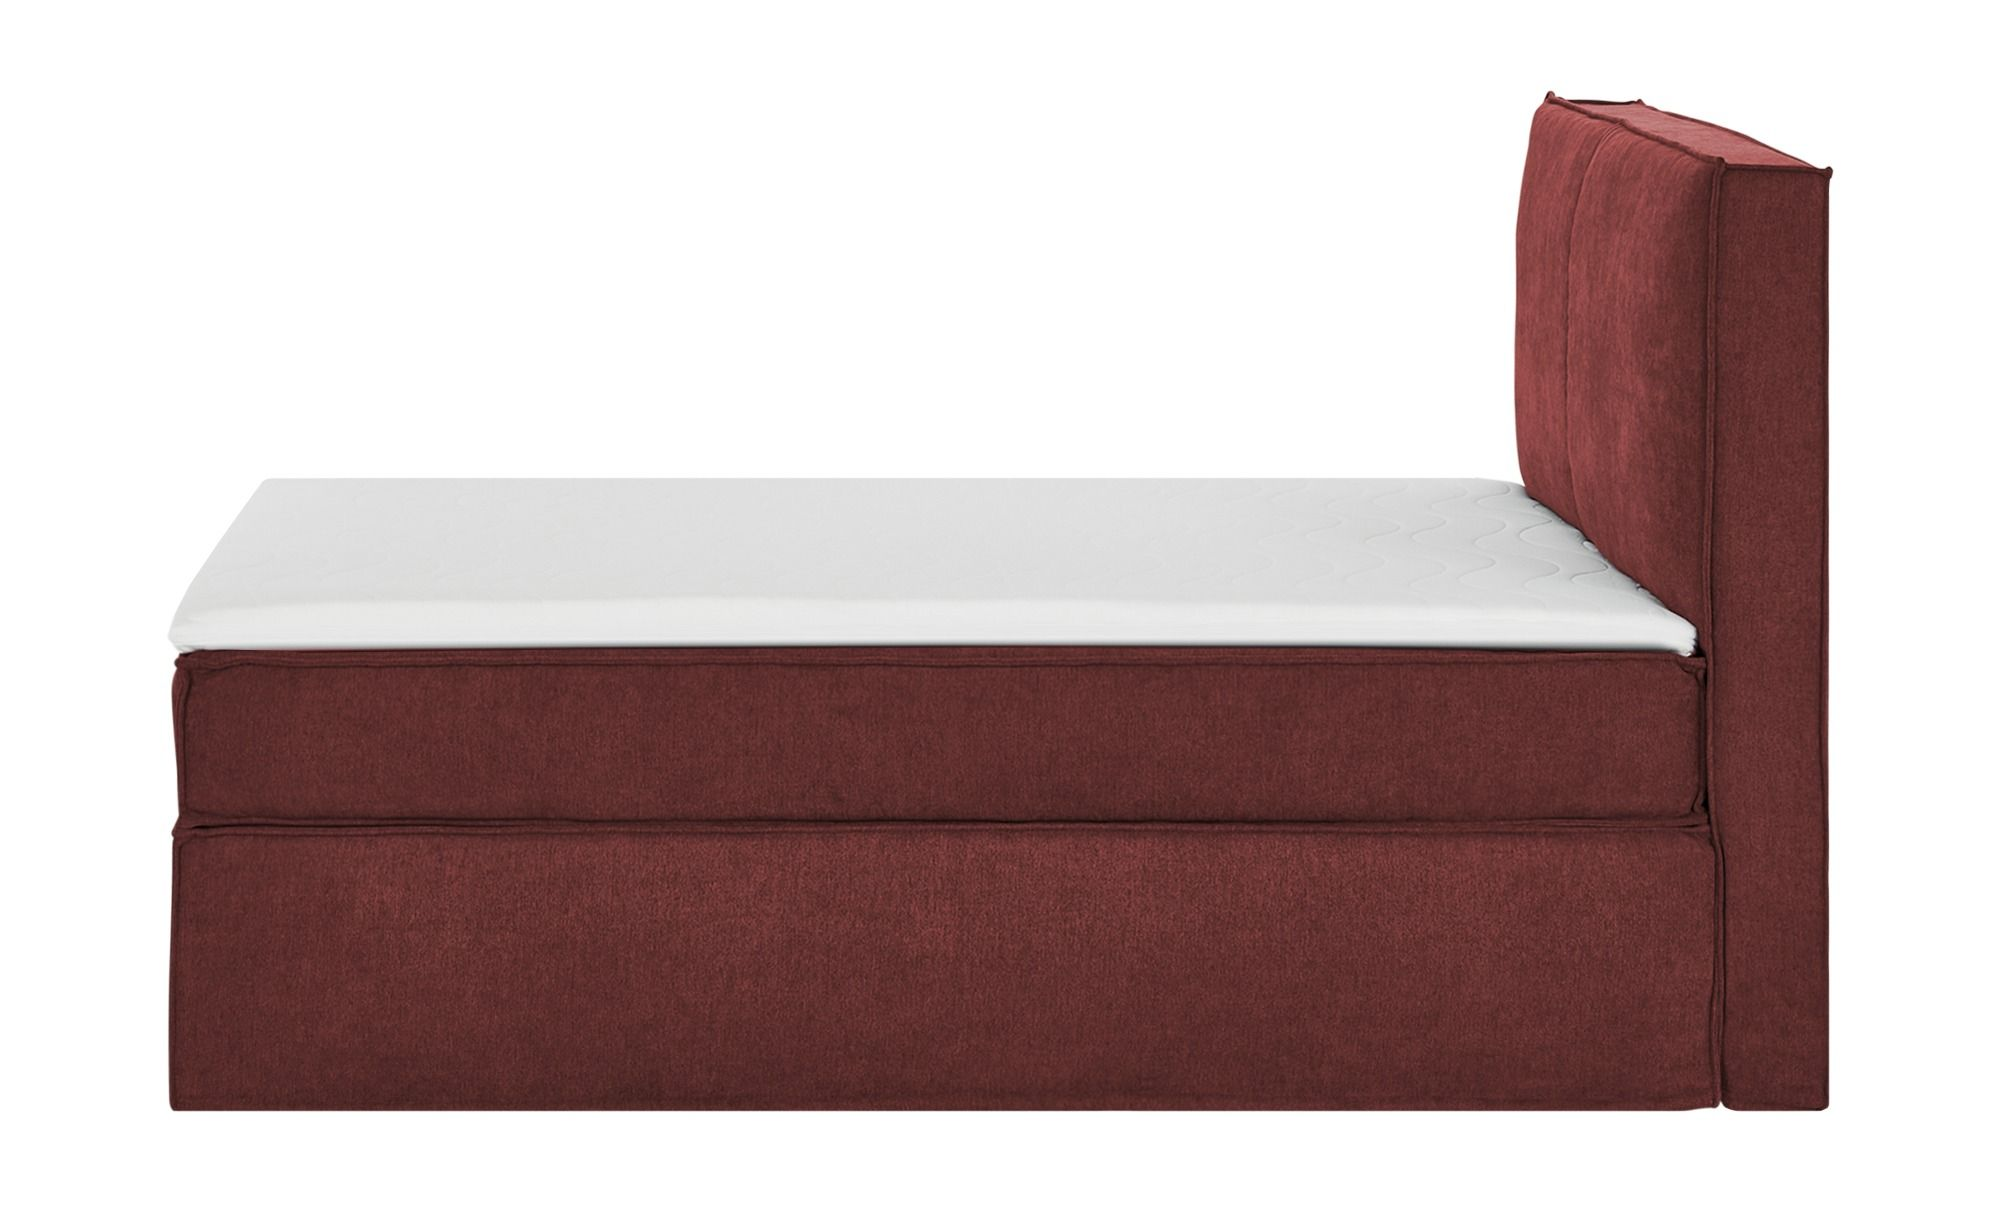 Photo of Boxi Urban box spring bed, found at Möbel Höffner